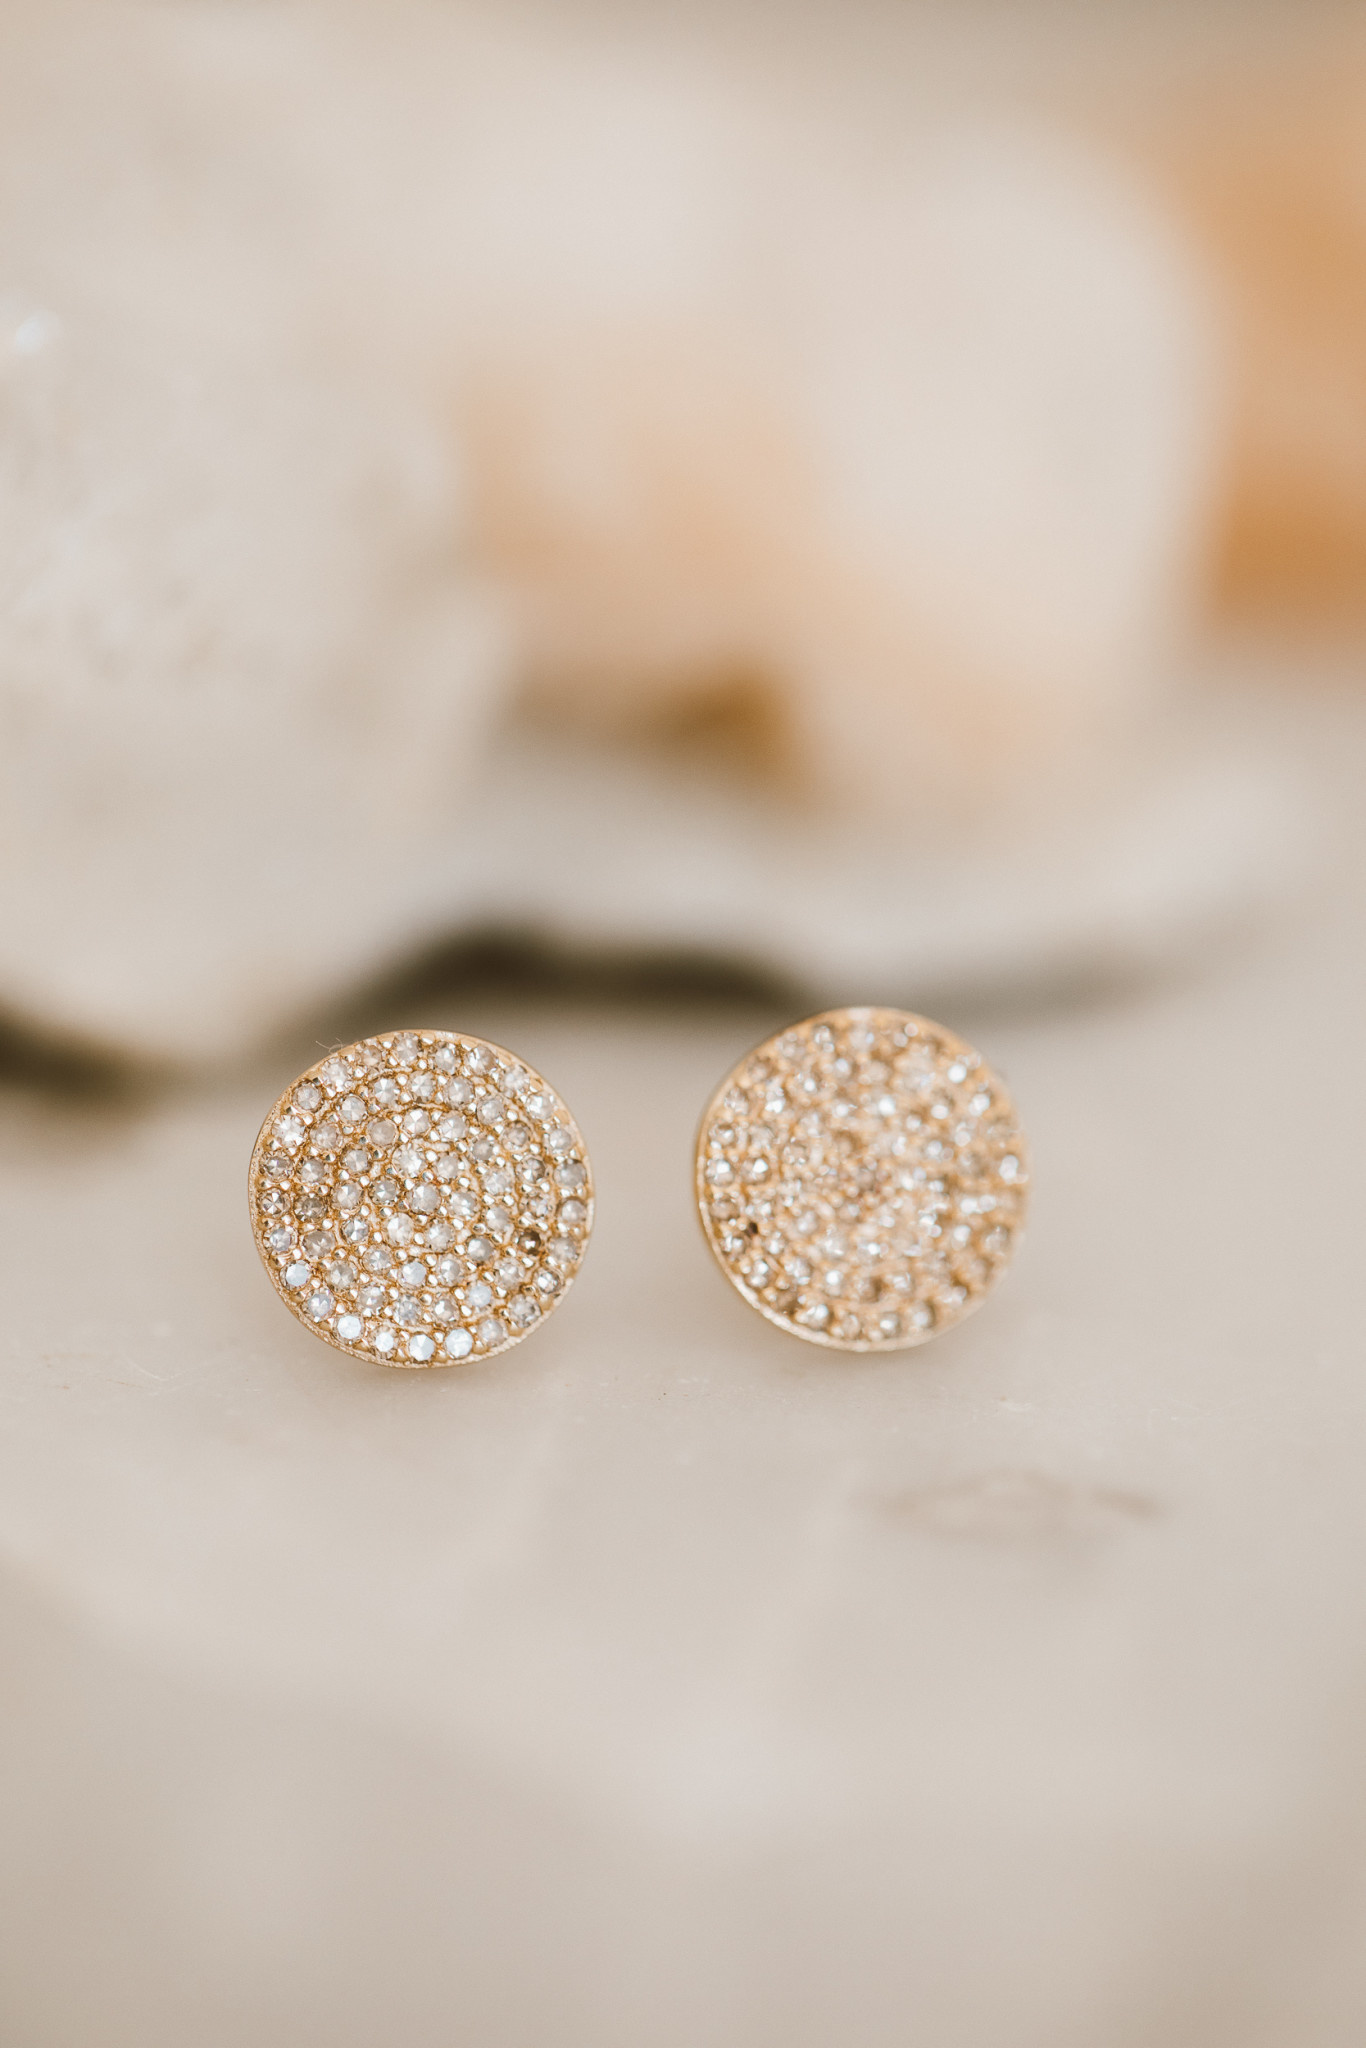 01f50495a2d Large Round Pave Diamond Studs 14kyg